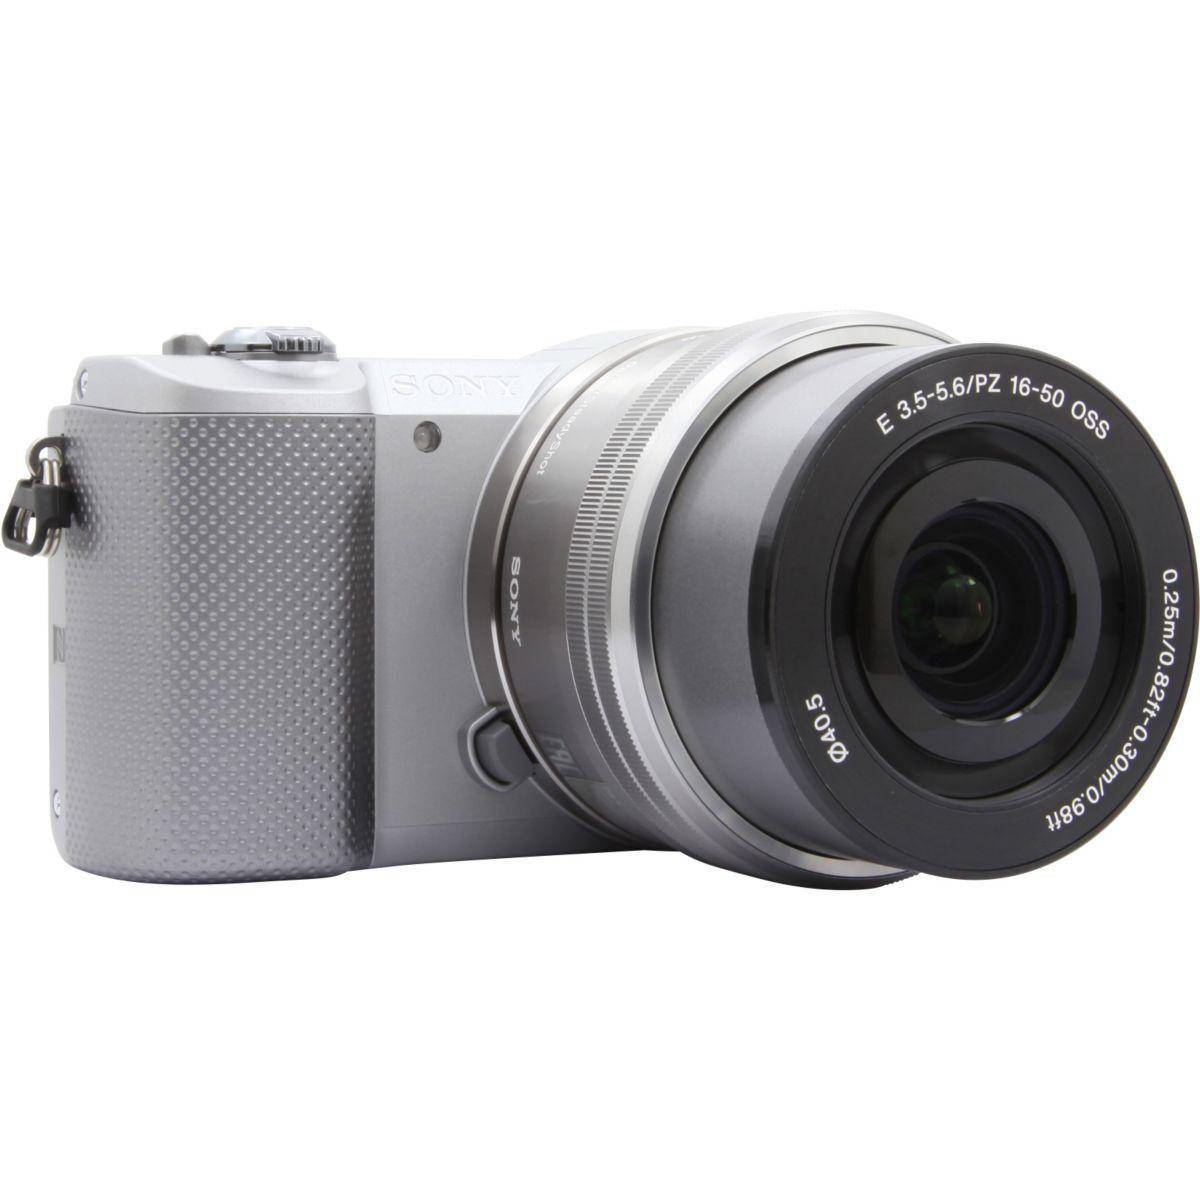 Appareil photo hybride sony a5000 gris + 16-50mm argent (photo)